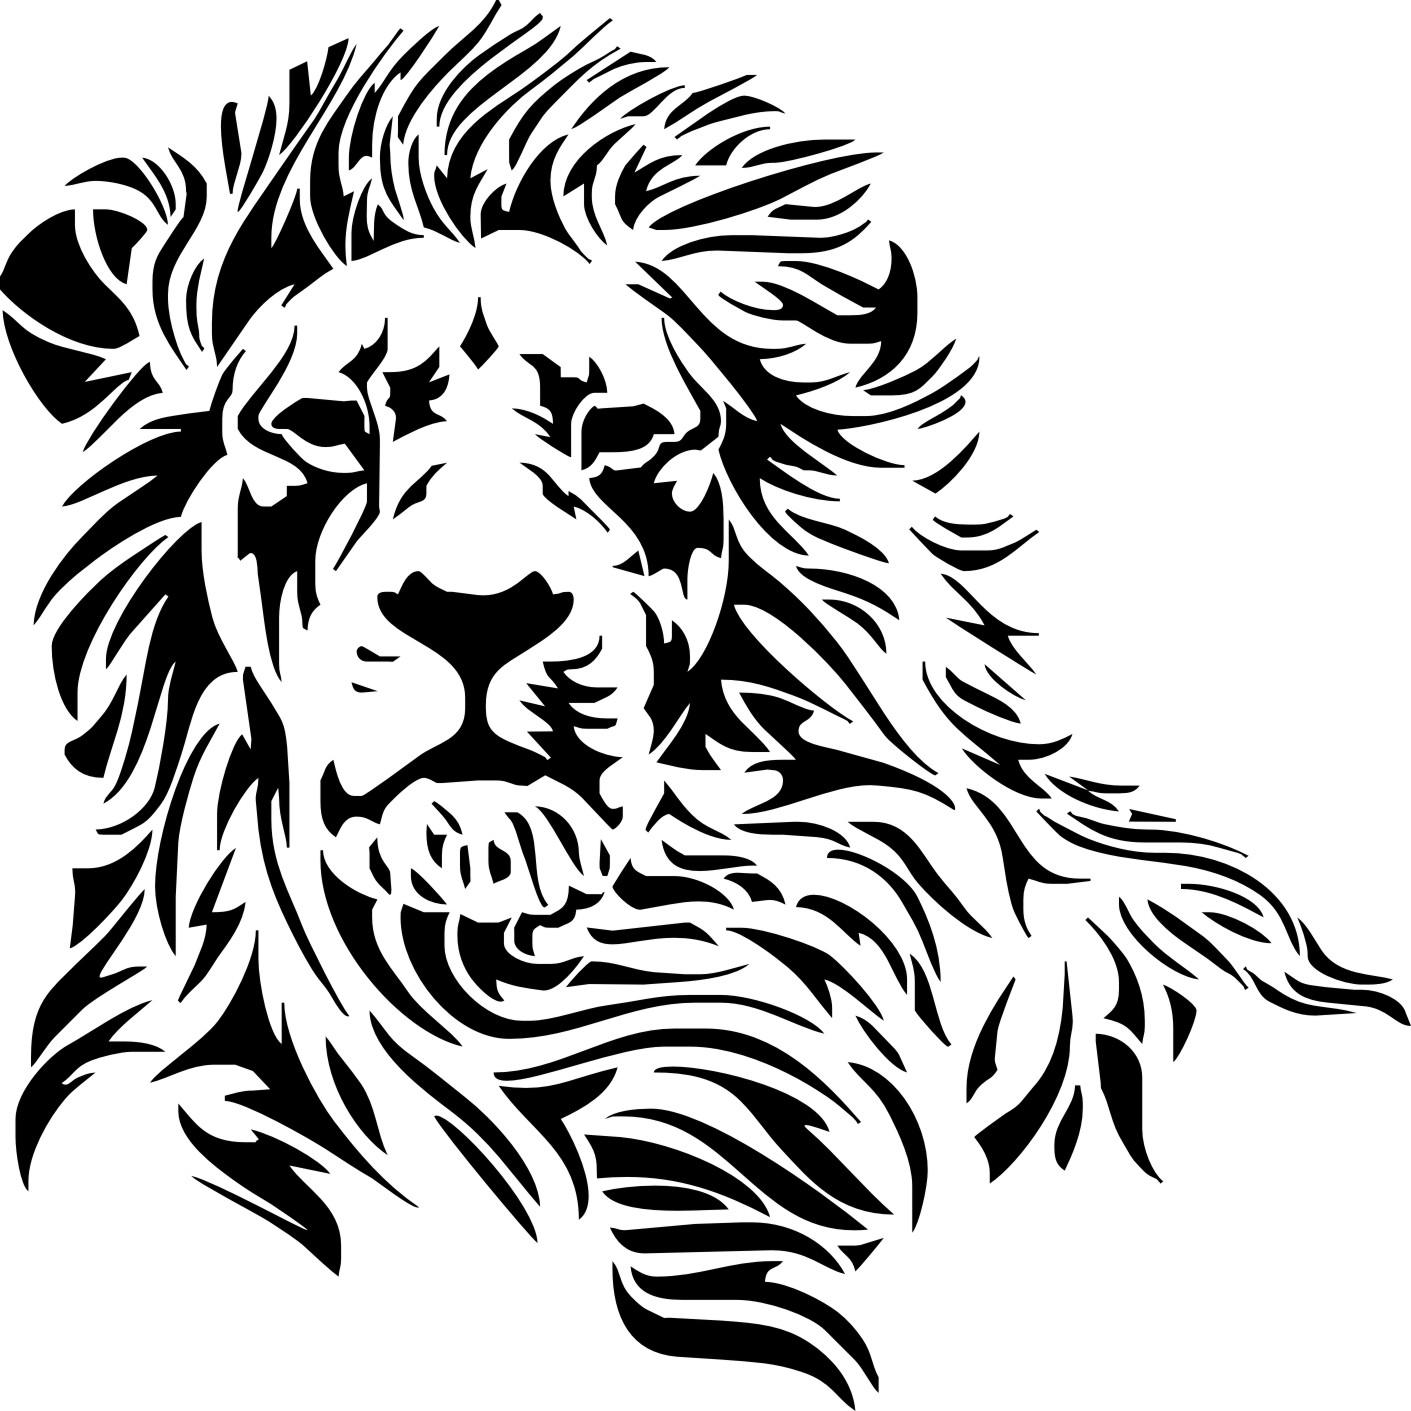 Sticker Blickfang: Wandtattoo Löwenkopf